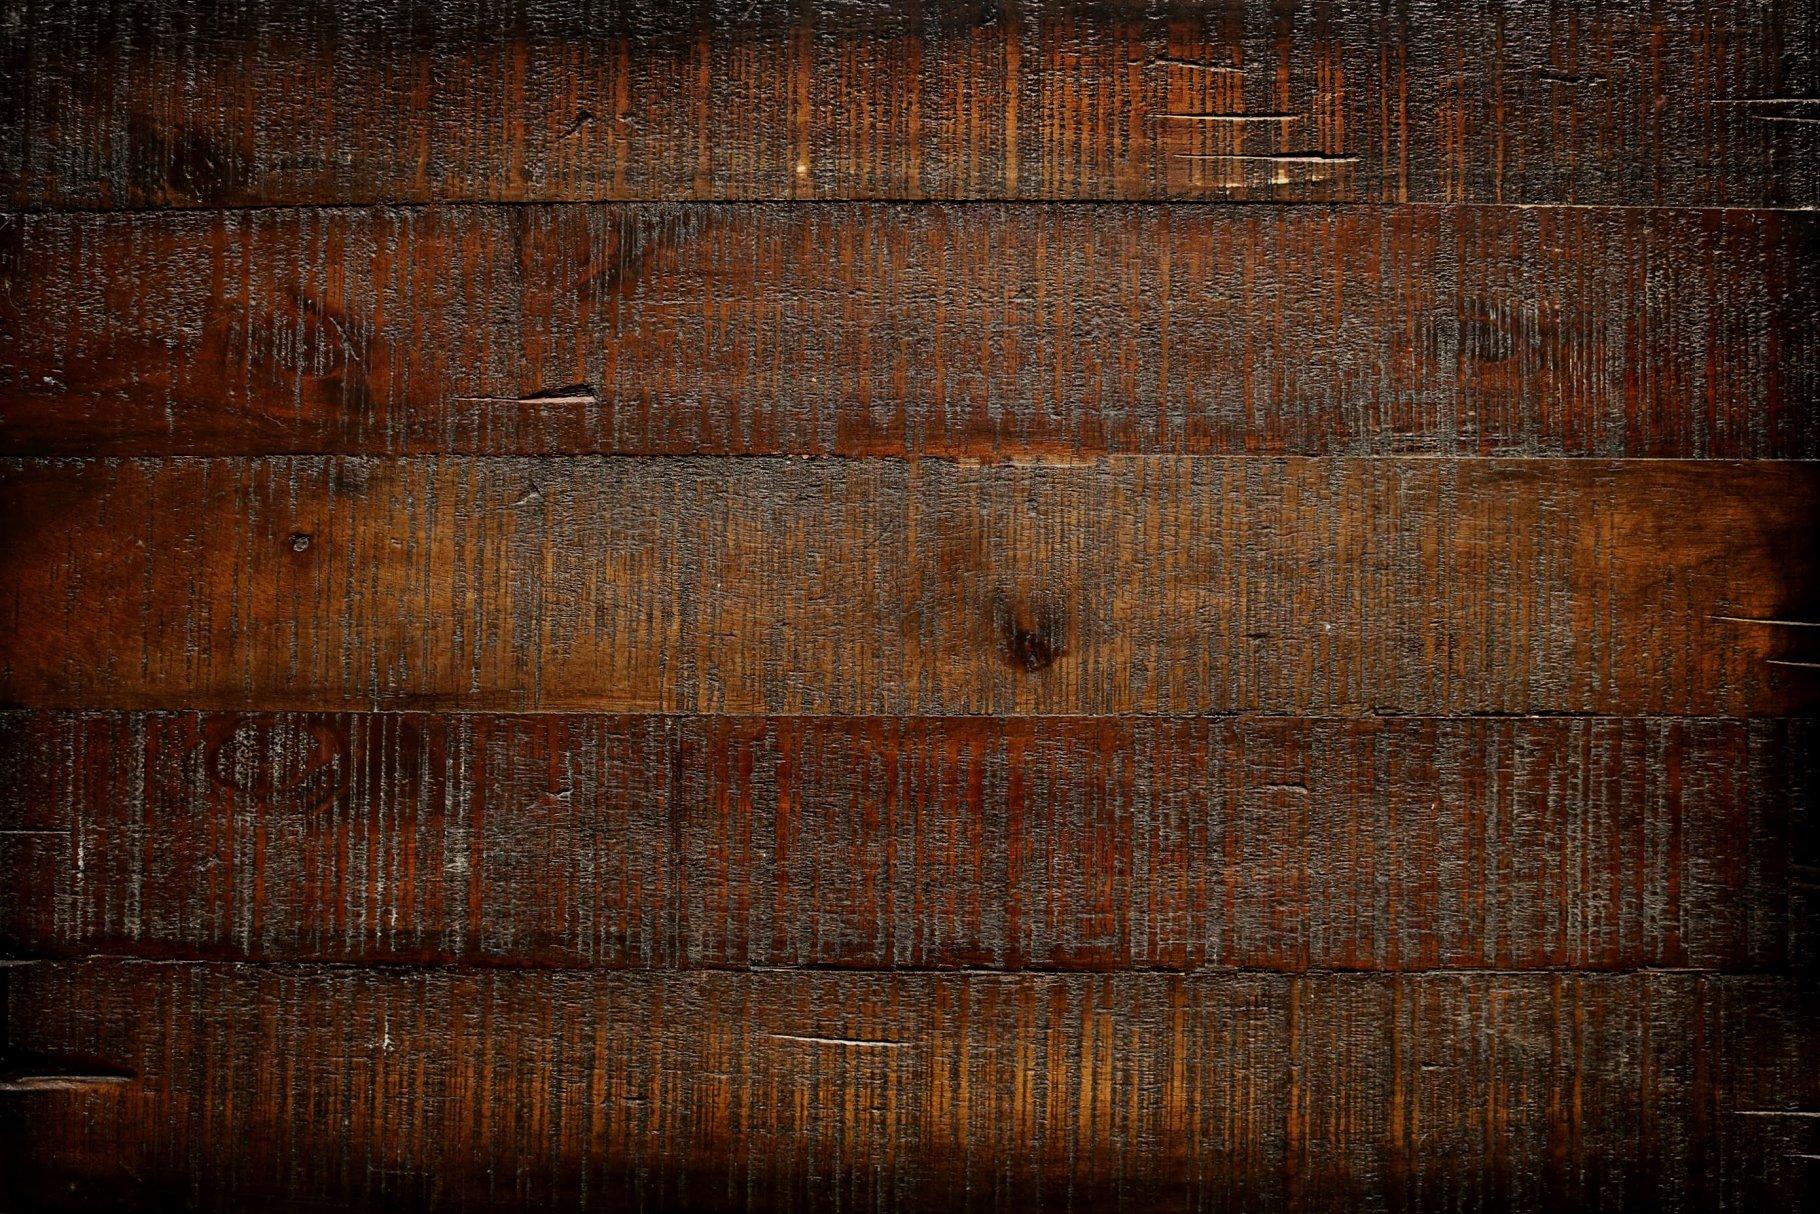 Dark Wood Background Texture Abstract Photos Creative Market